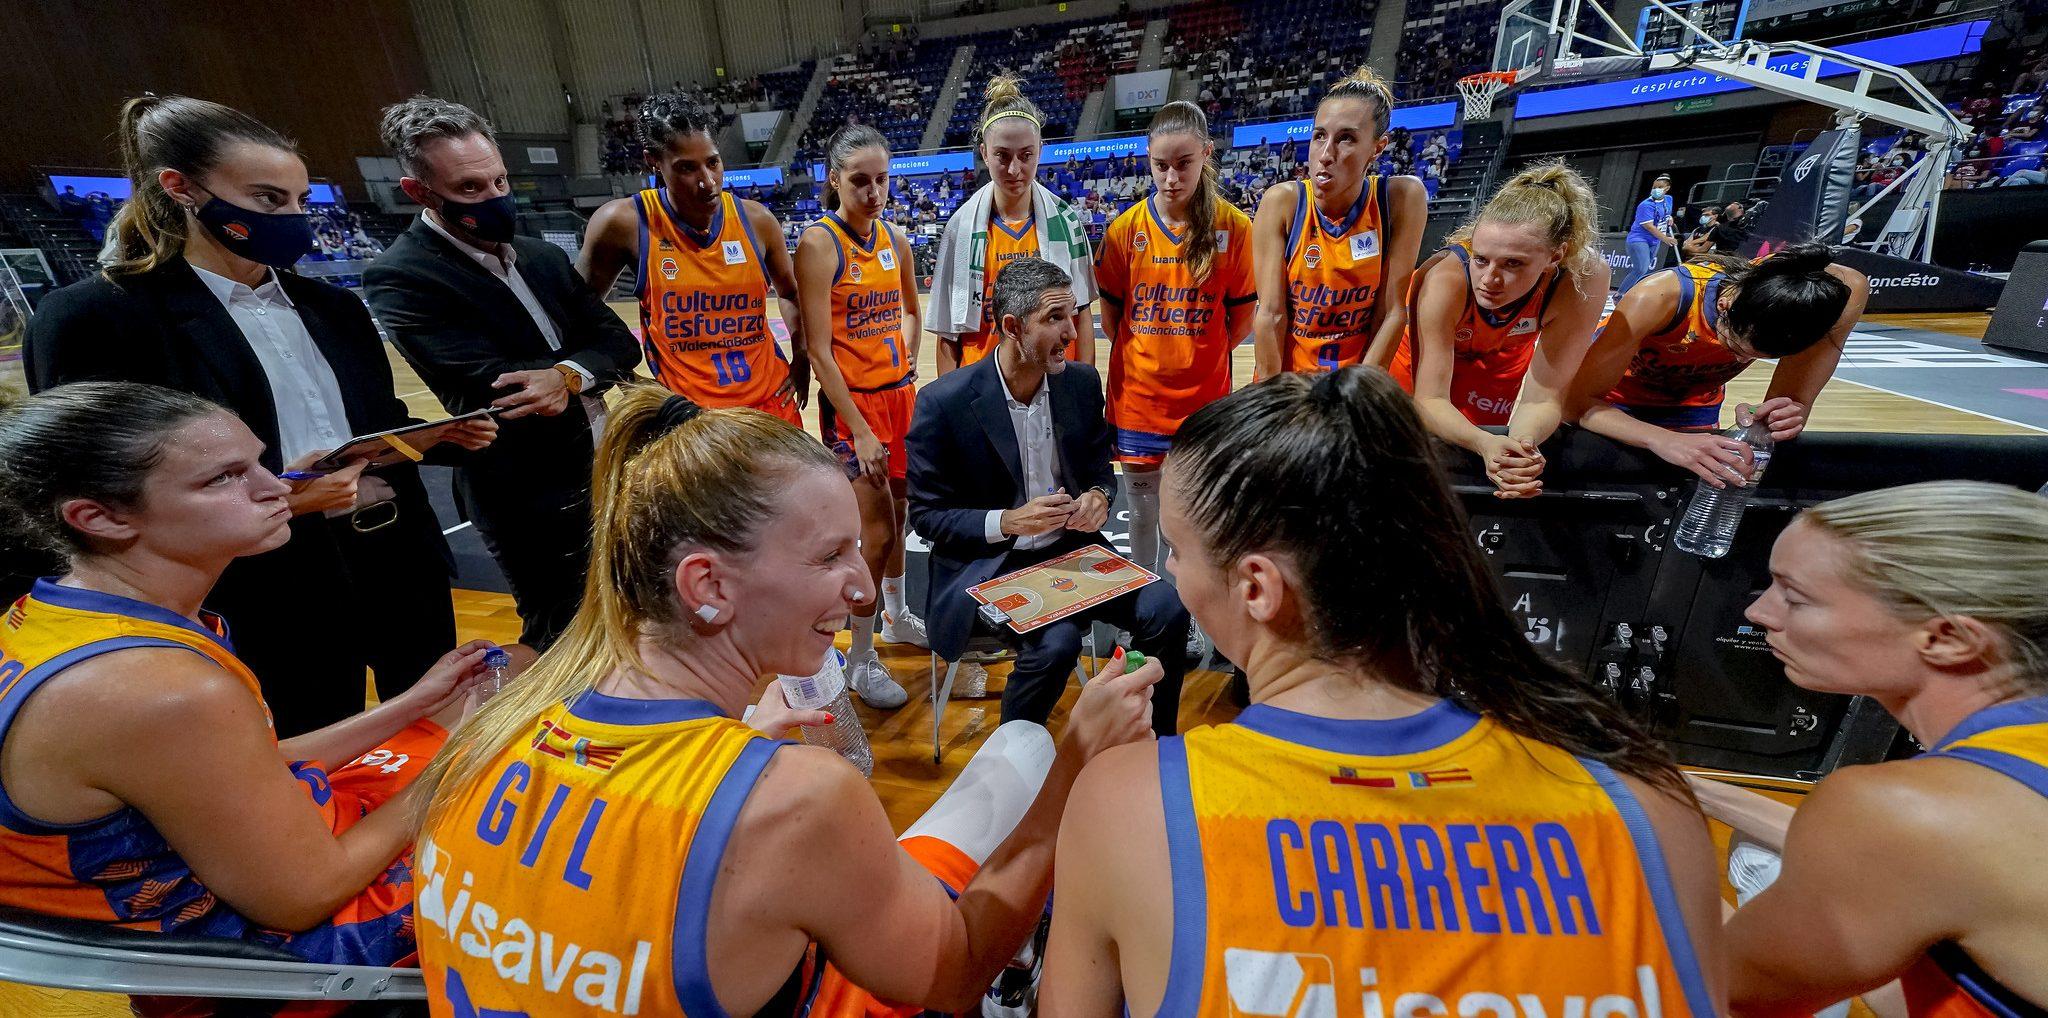 Valencia: Clasificatorio a EuroLeague contra Schio y Bourges